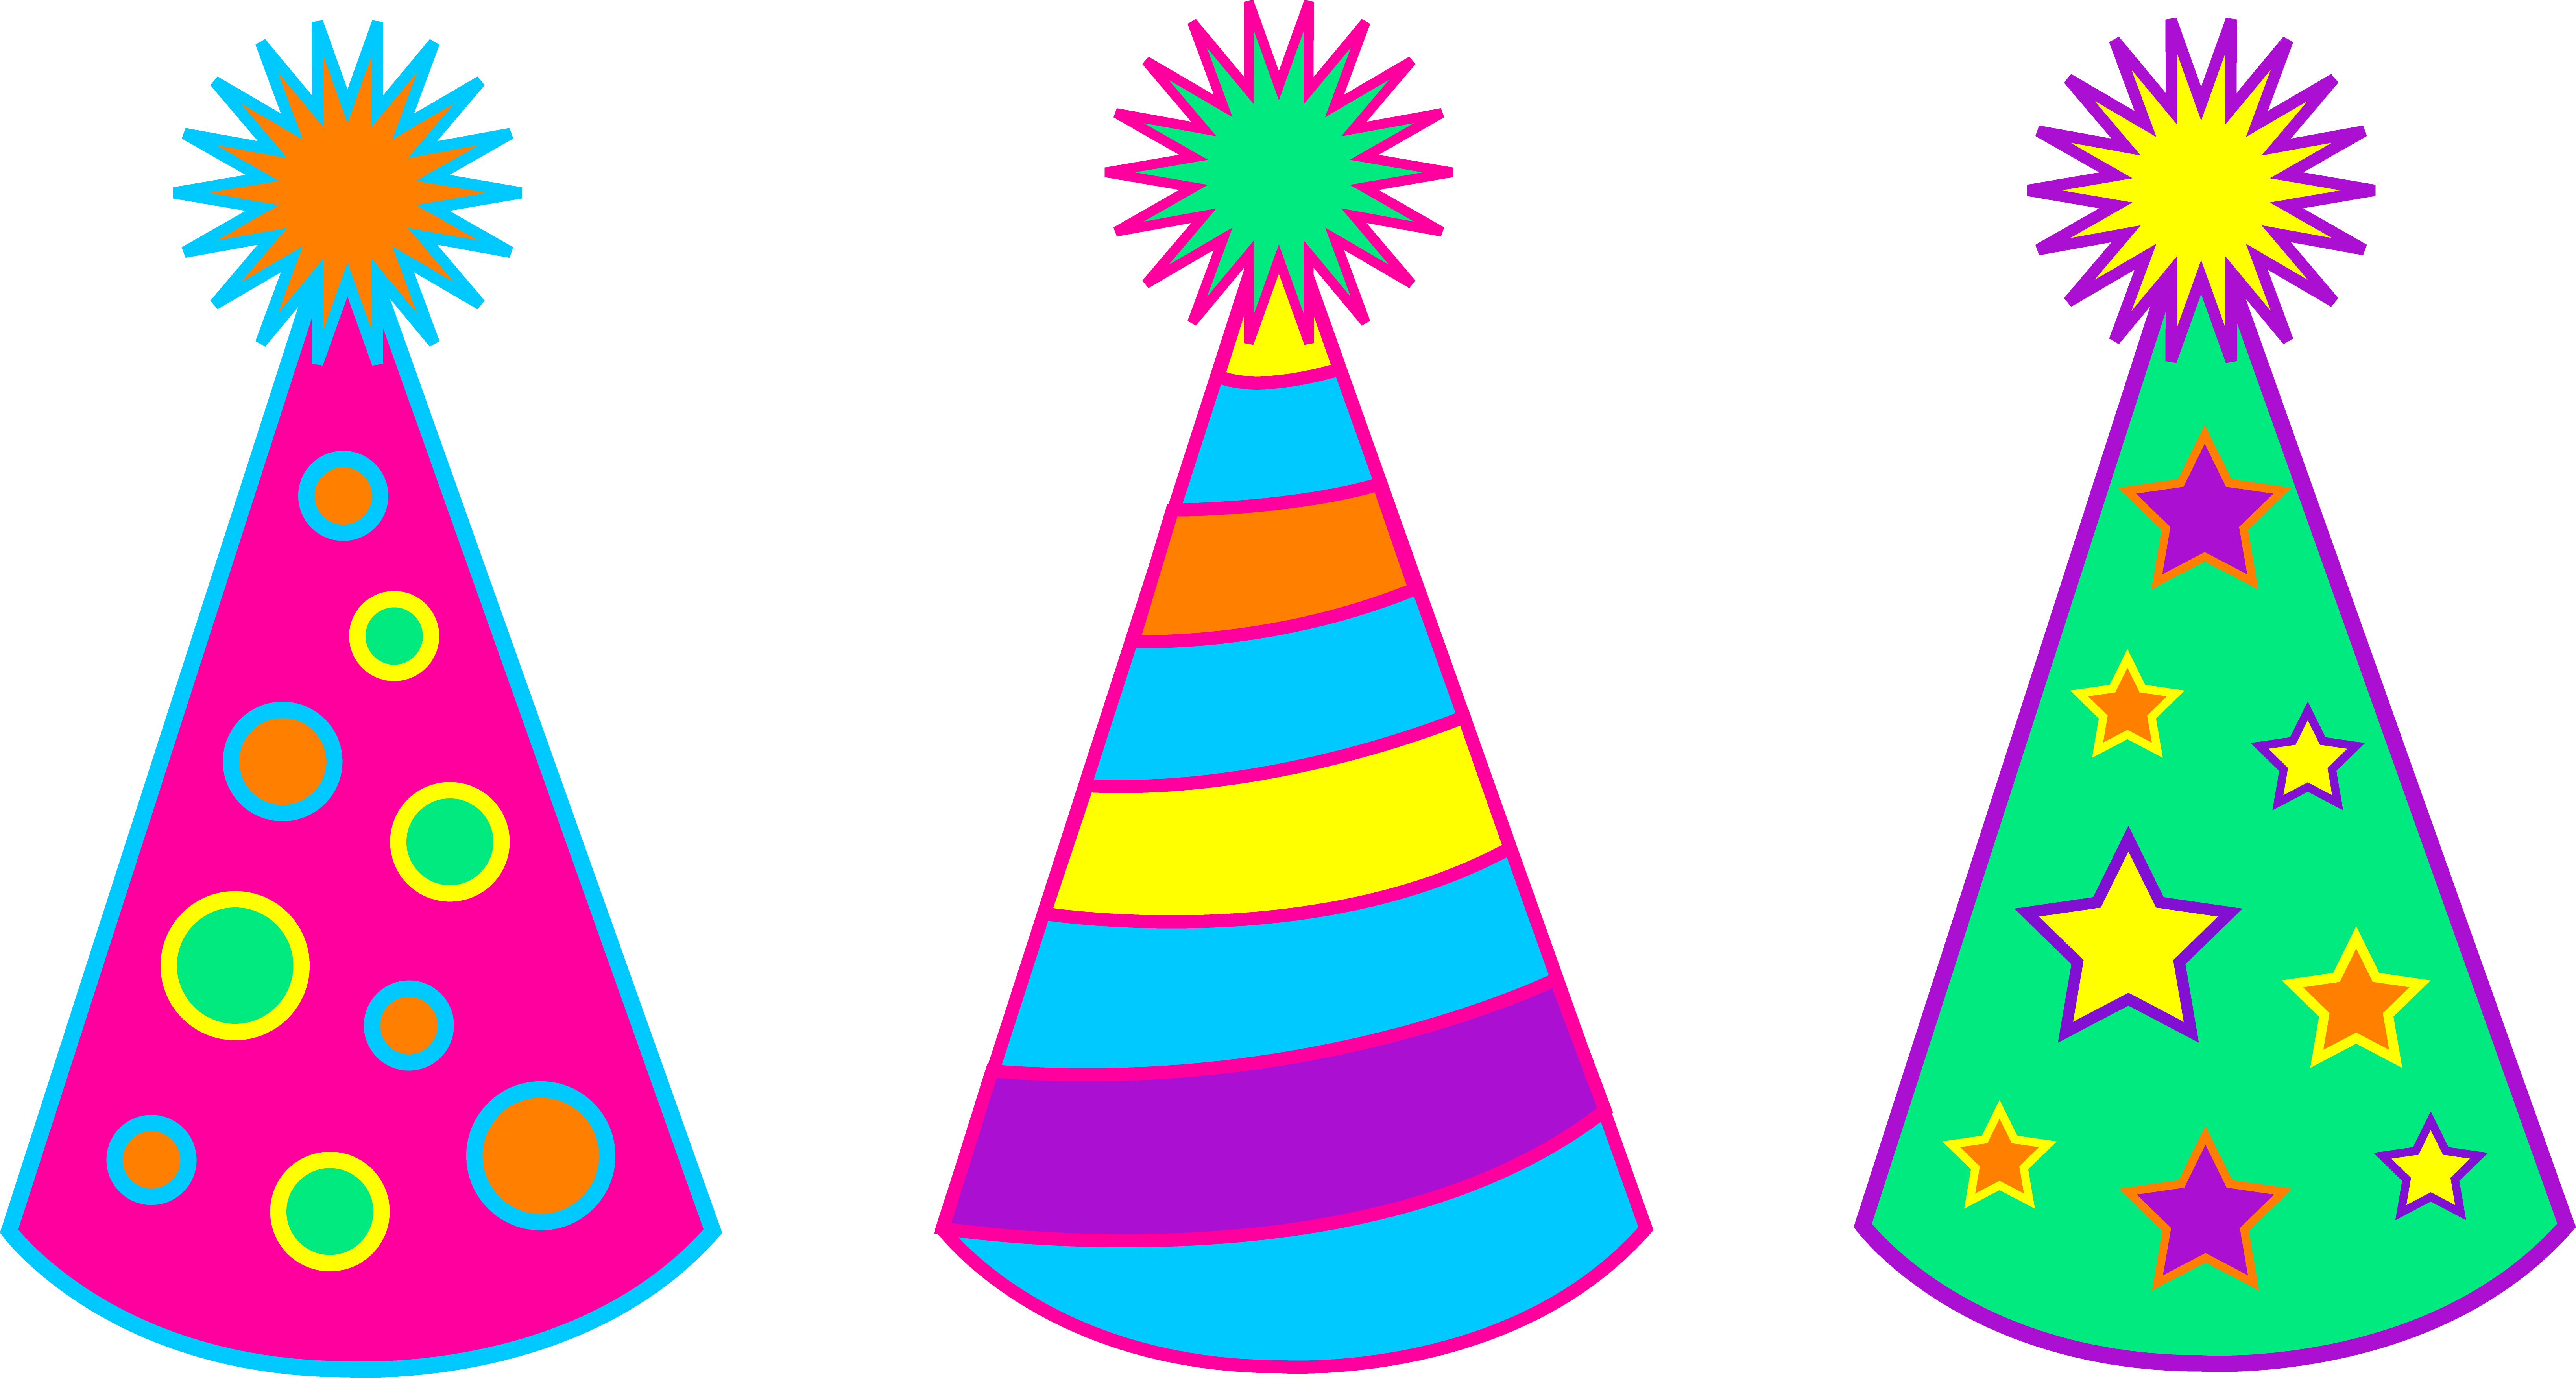 6547x3502 Candle Clipart Pastel Color